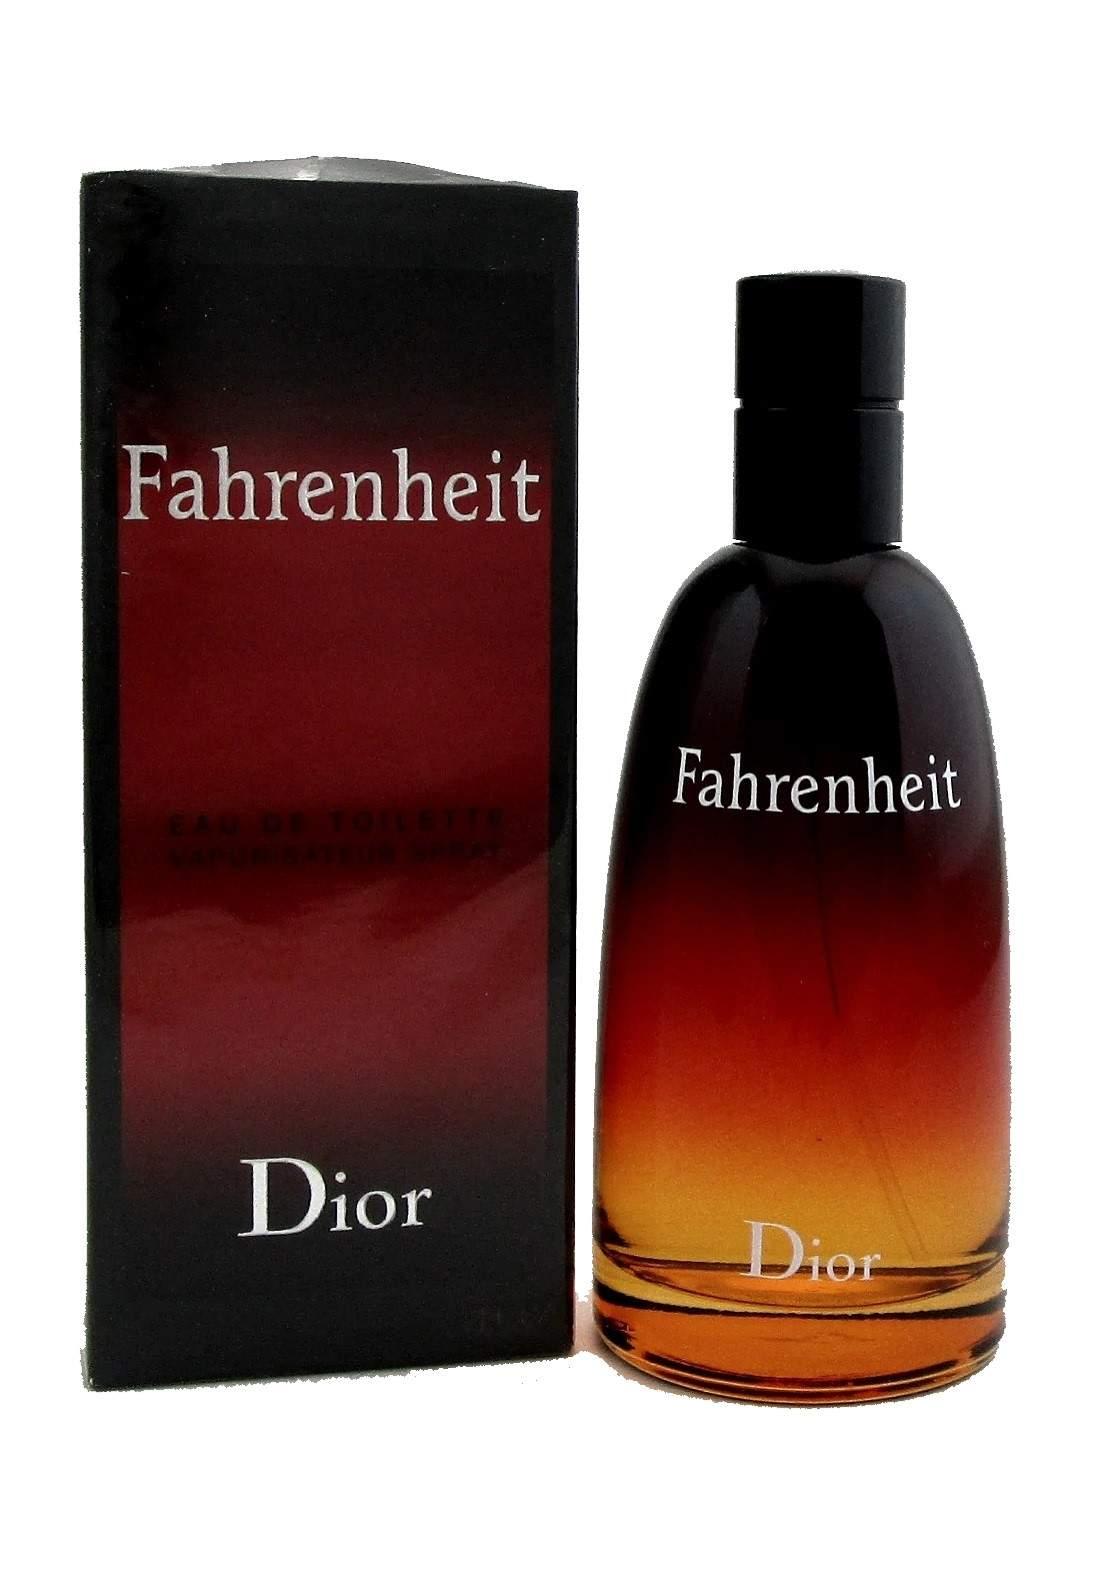 Dior Fahrenheit edt 100 ml عطر رجالي